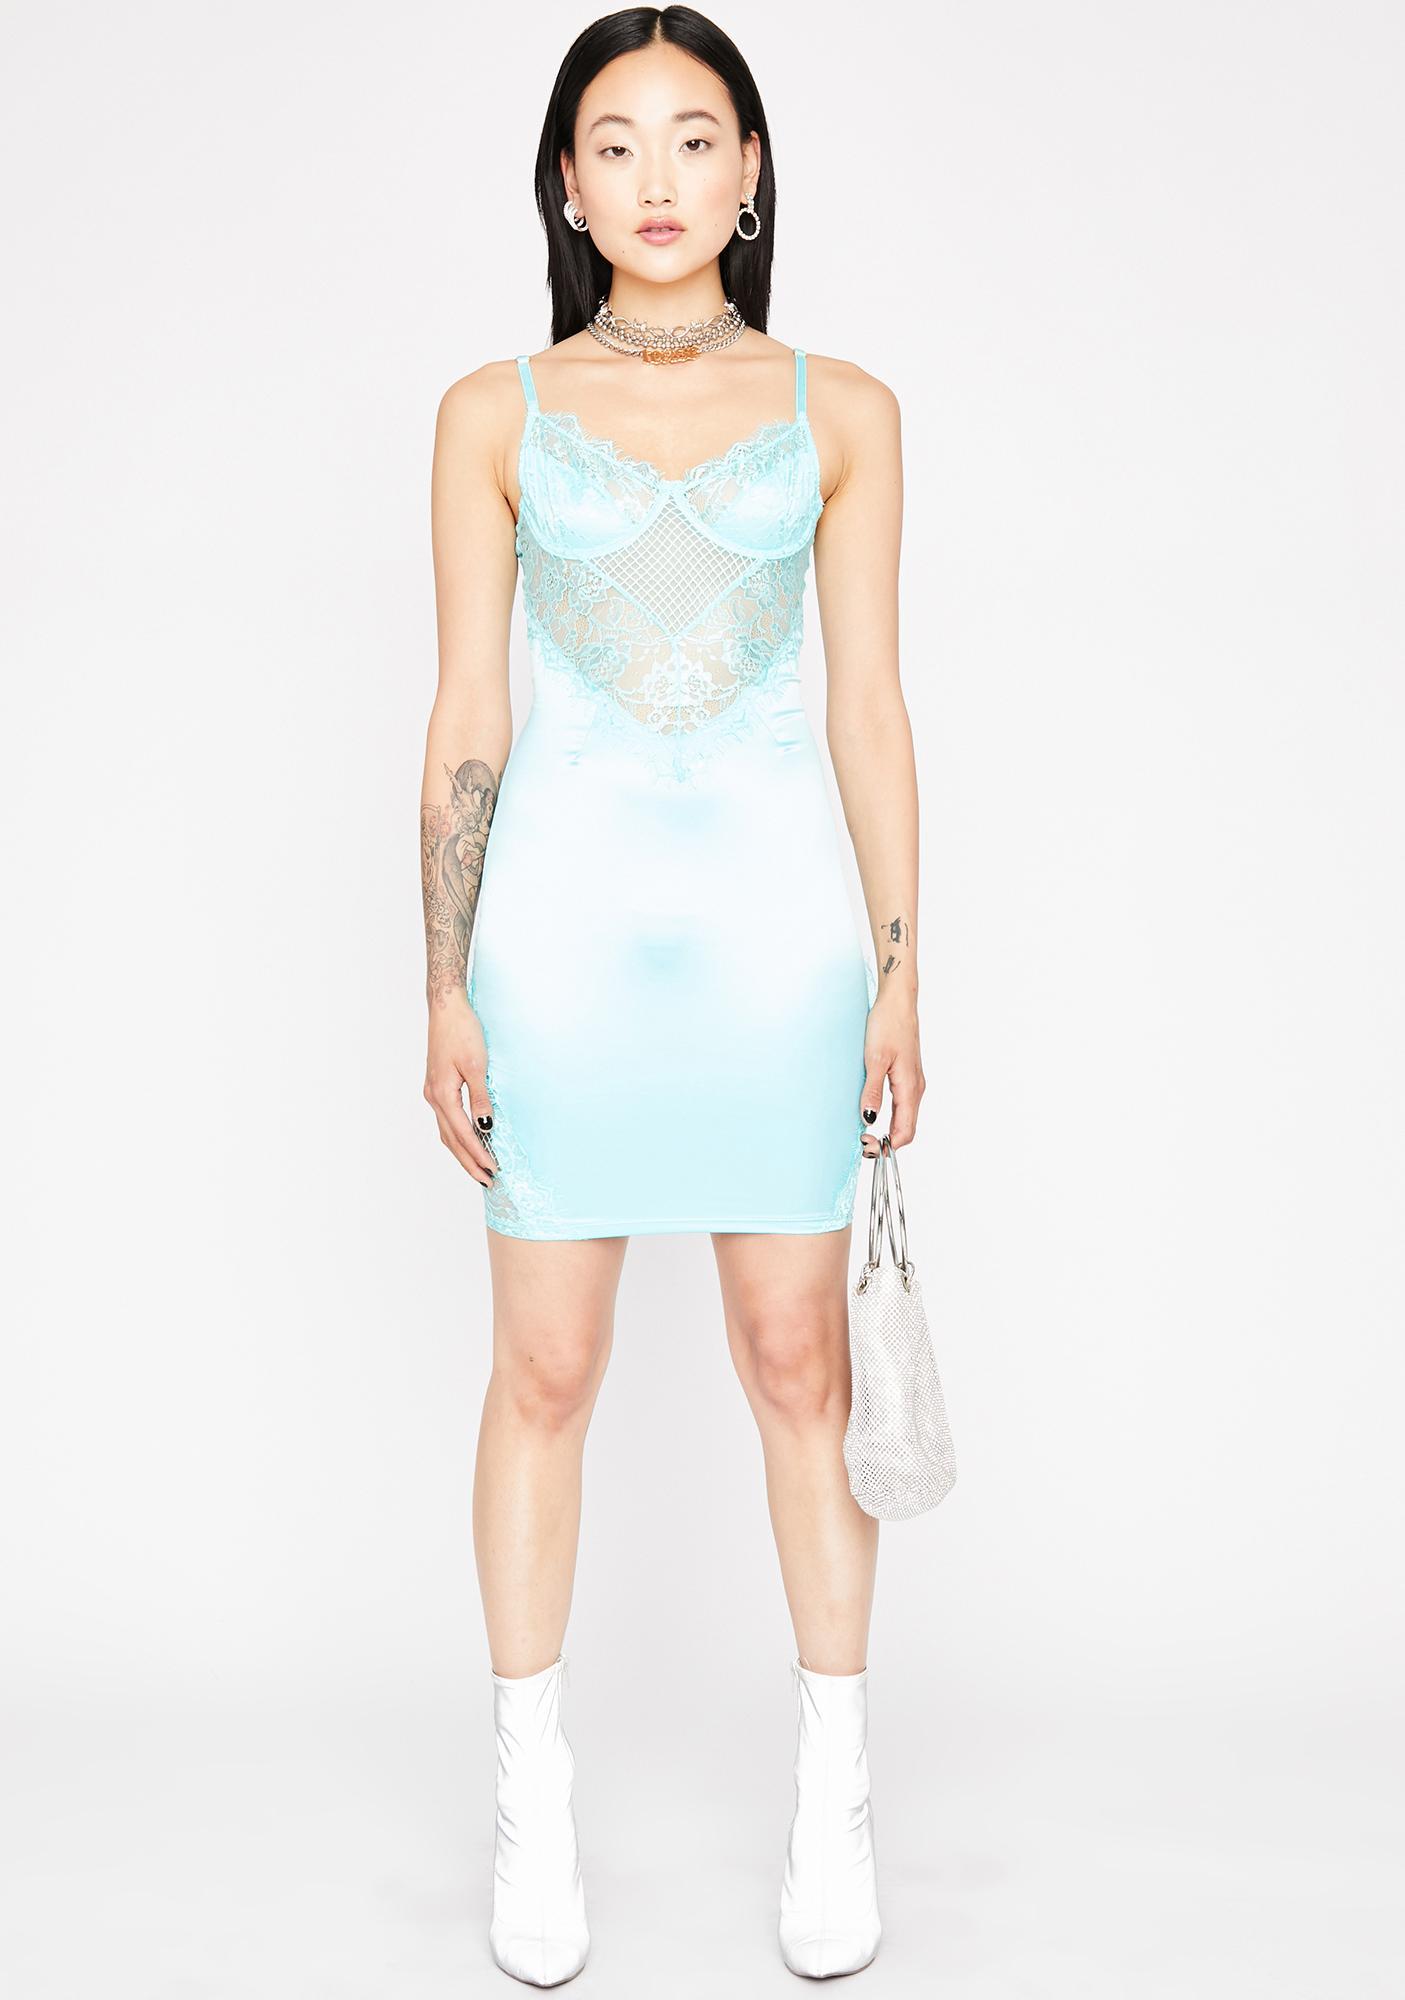 Polar Club Fever Lace Dress